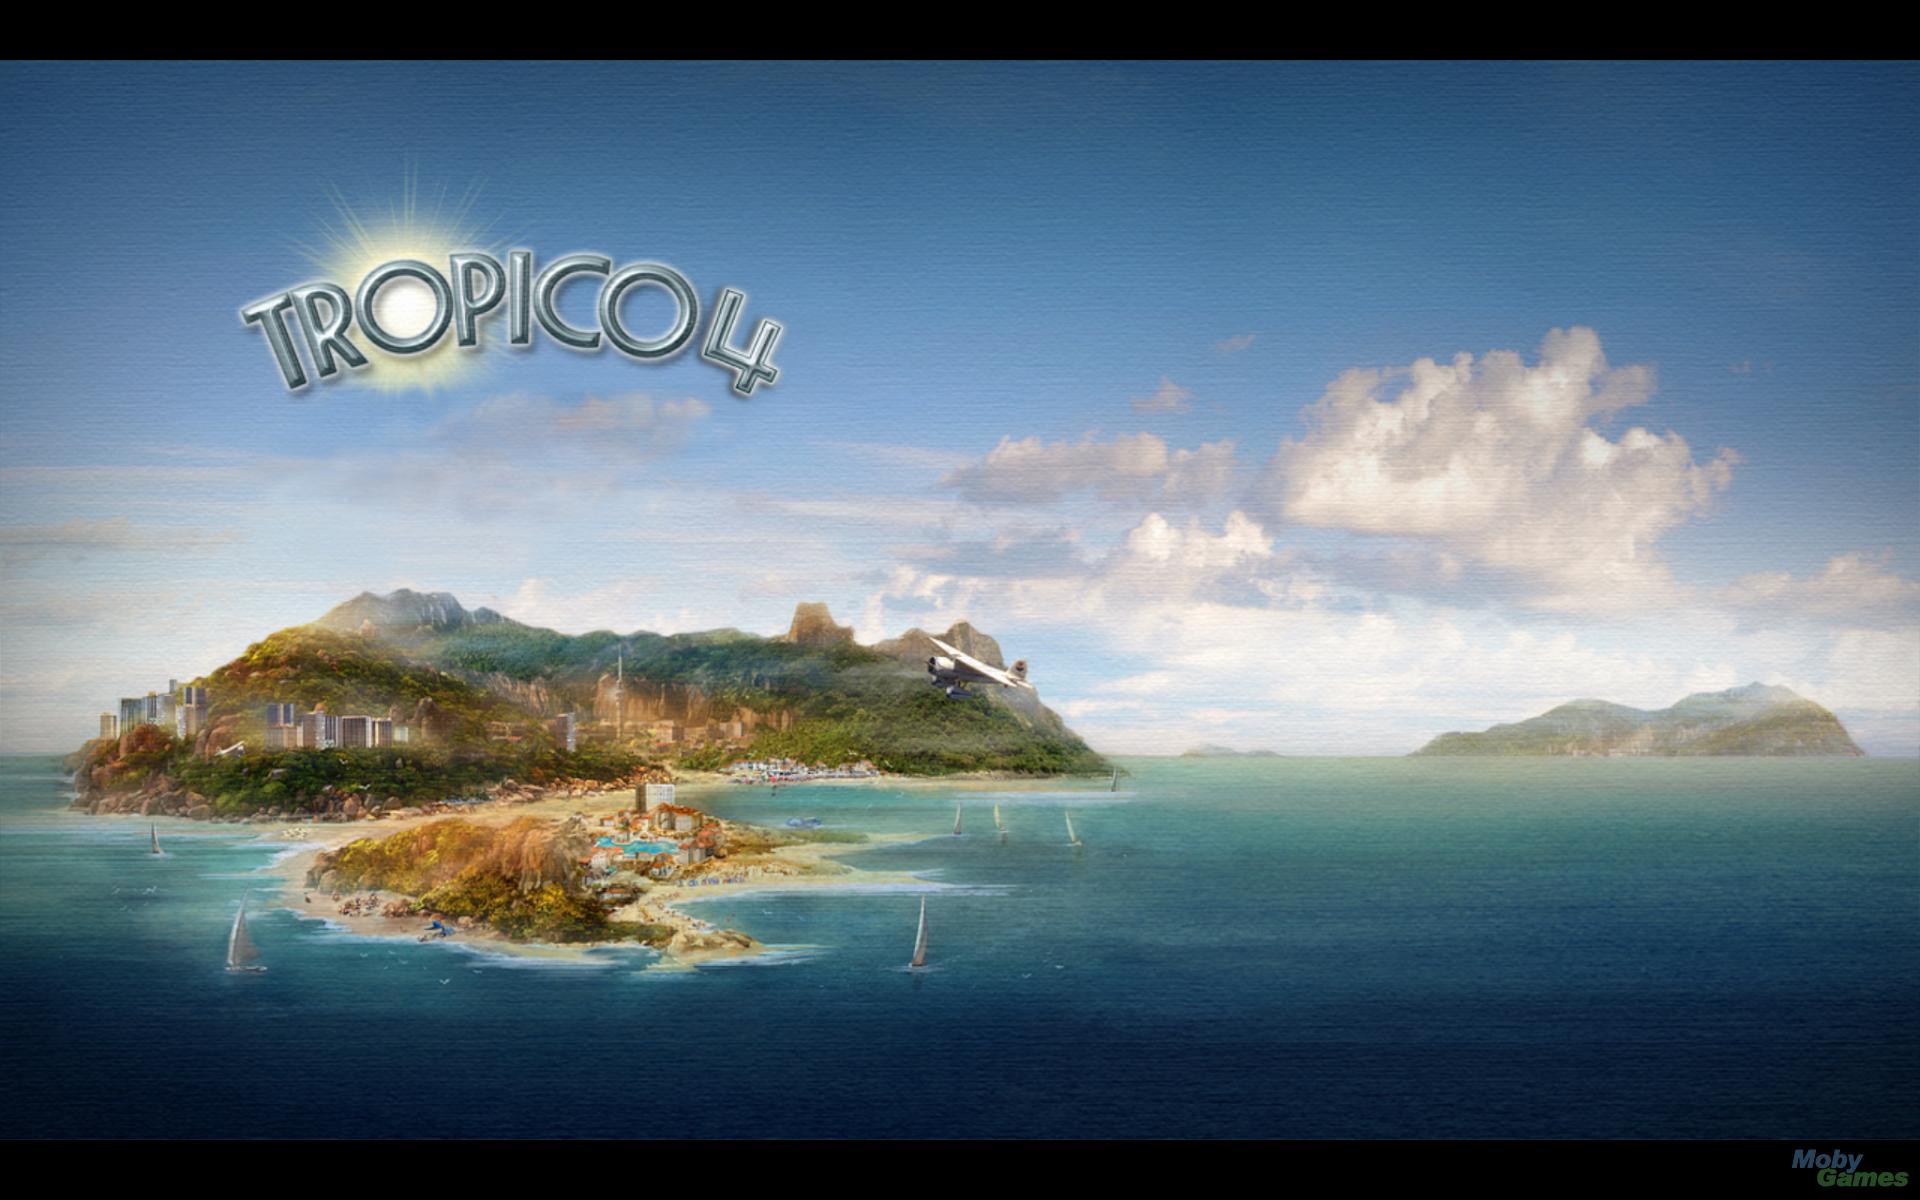 HQ Tropico 4 Wallpapers | File 2207.24Kb